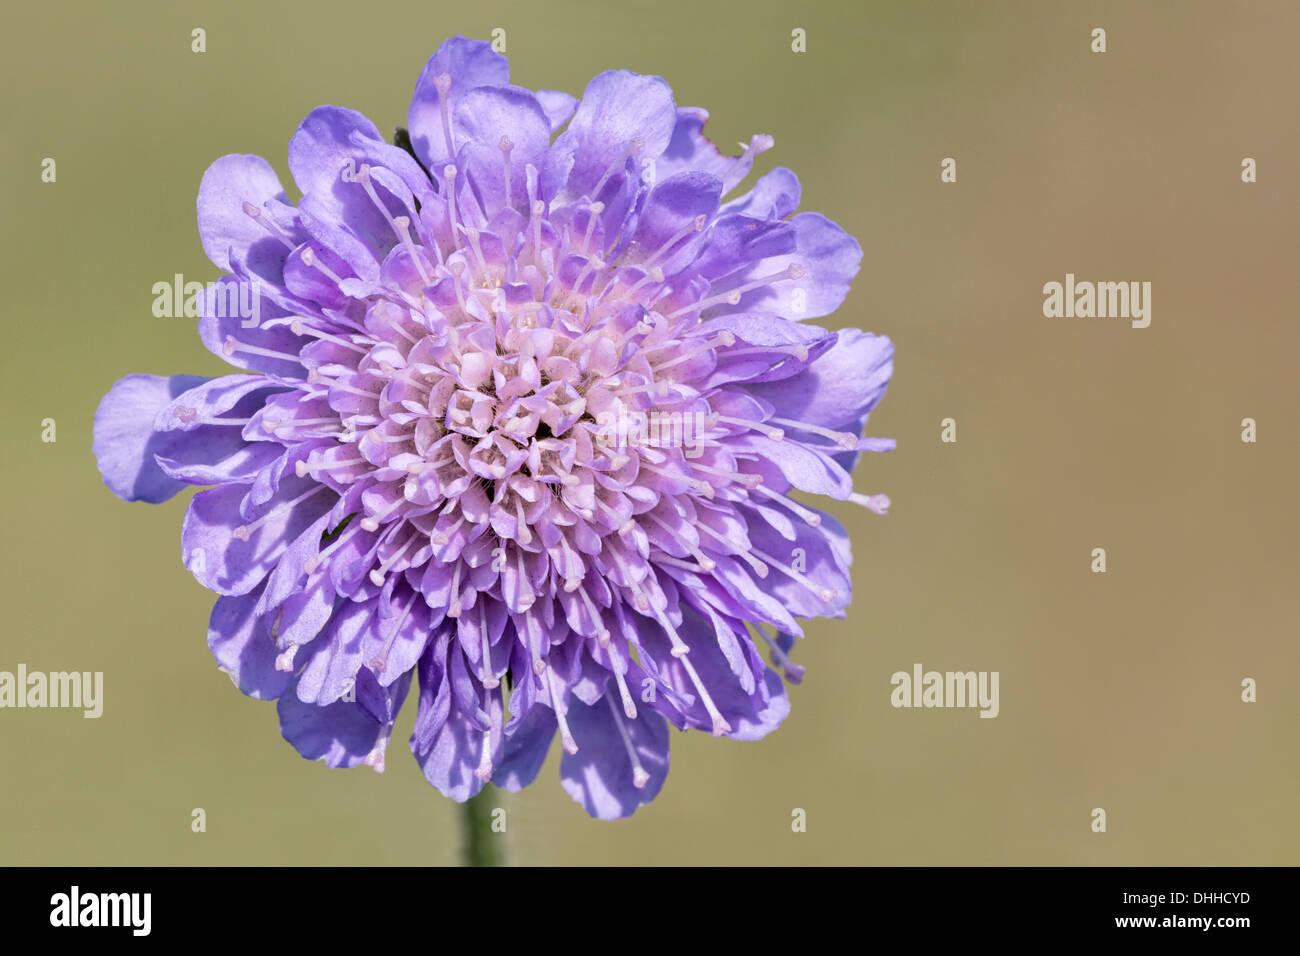 Field Scabious flower head detail - Stock Image